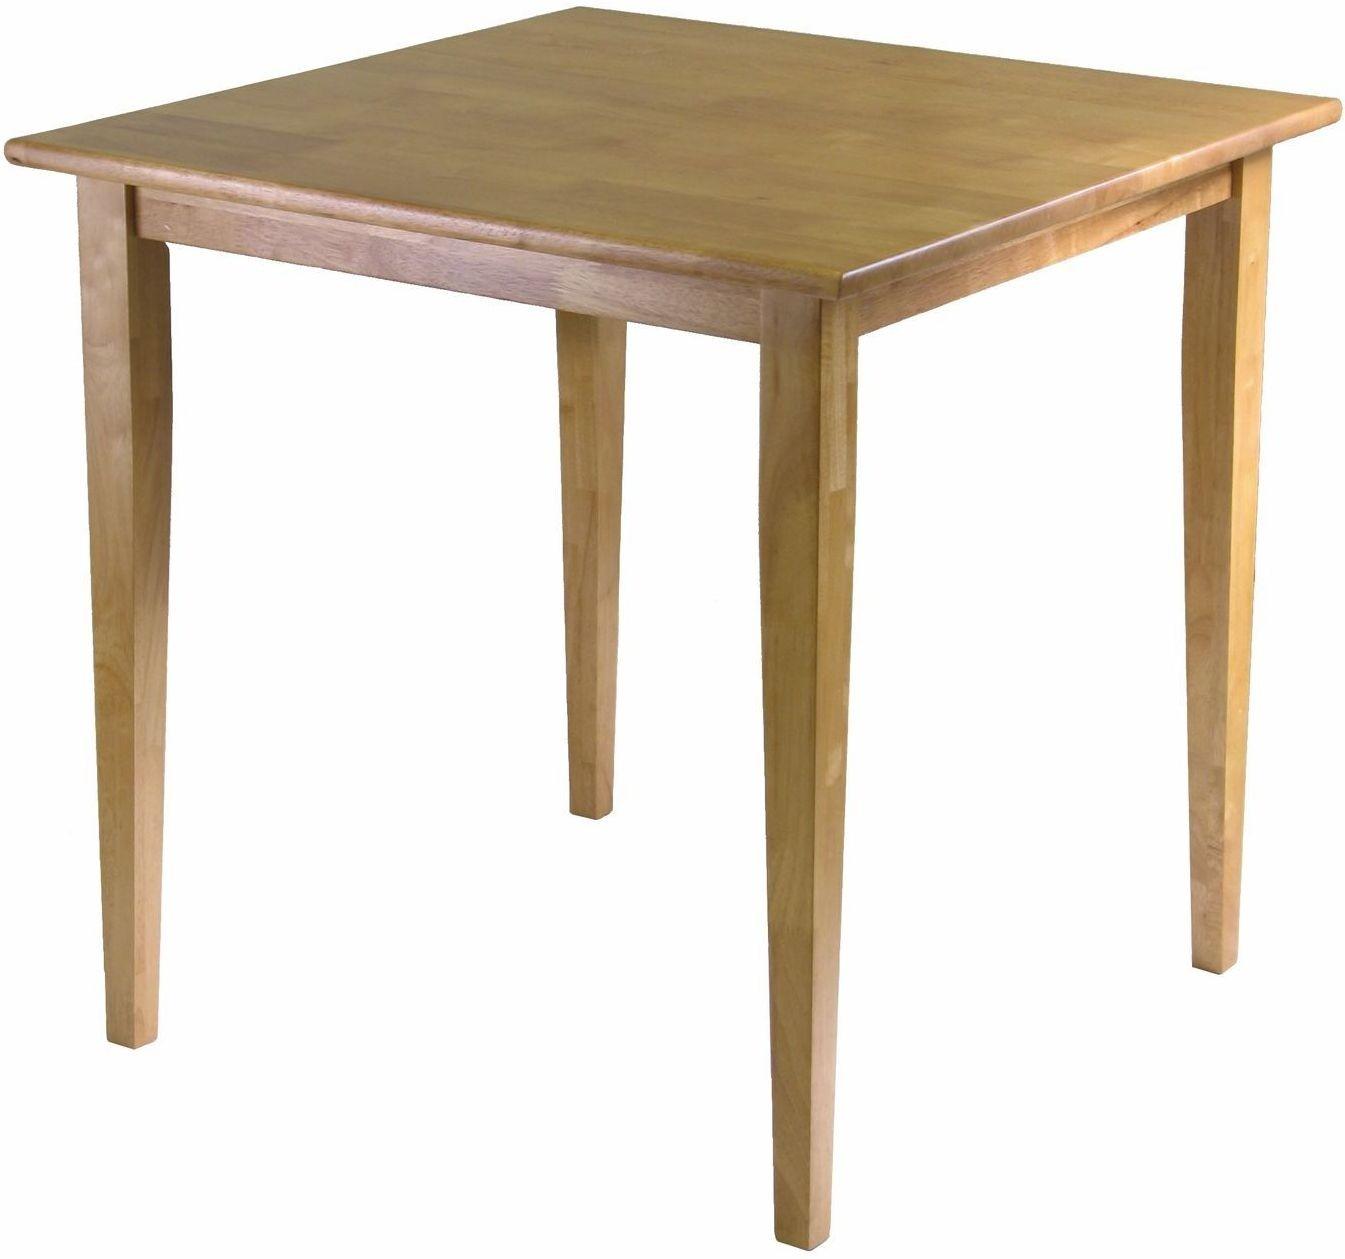 Groveland Light Oak Square Dining Table from WinsomeWood  : 34130 grovelandwinsomewoods from colemanfurniture.com size 1345 x 1259 jpeg 102kB